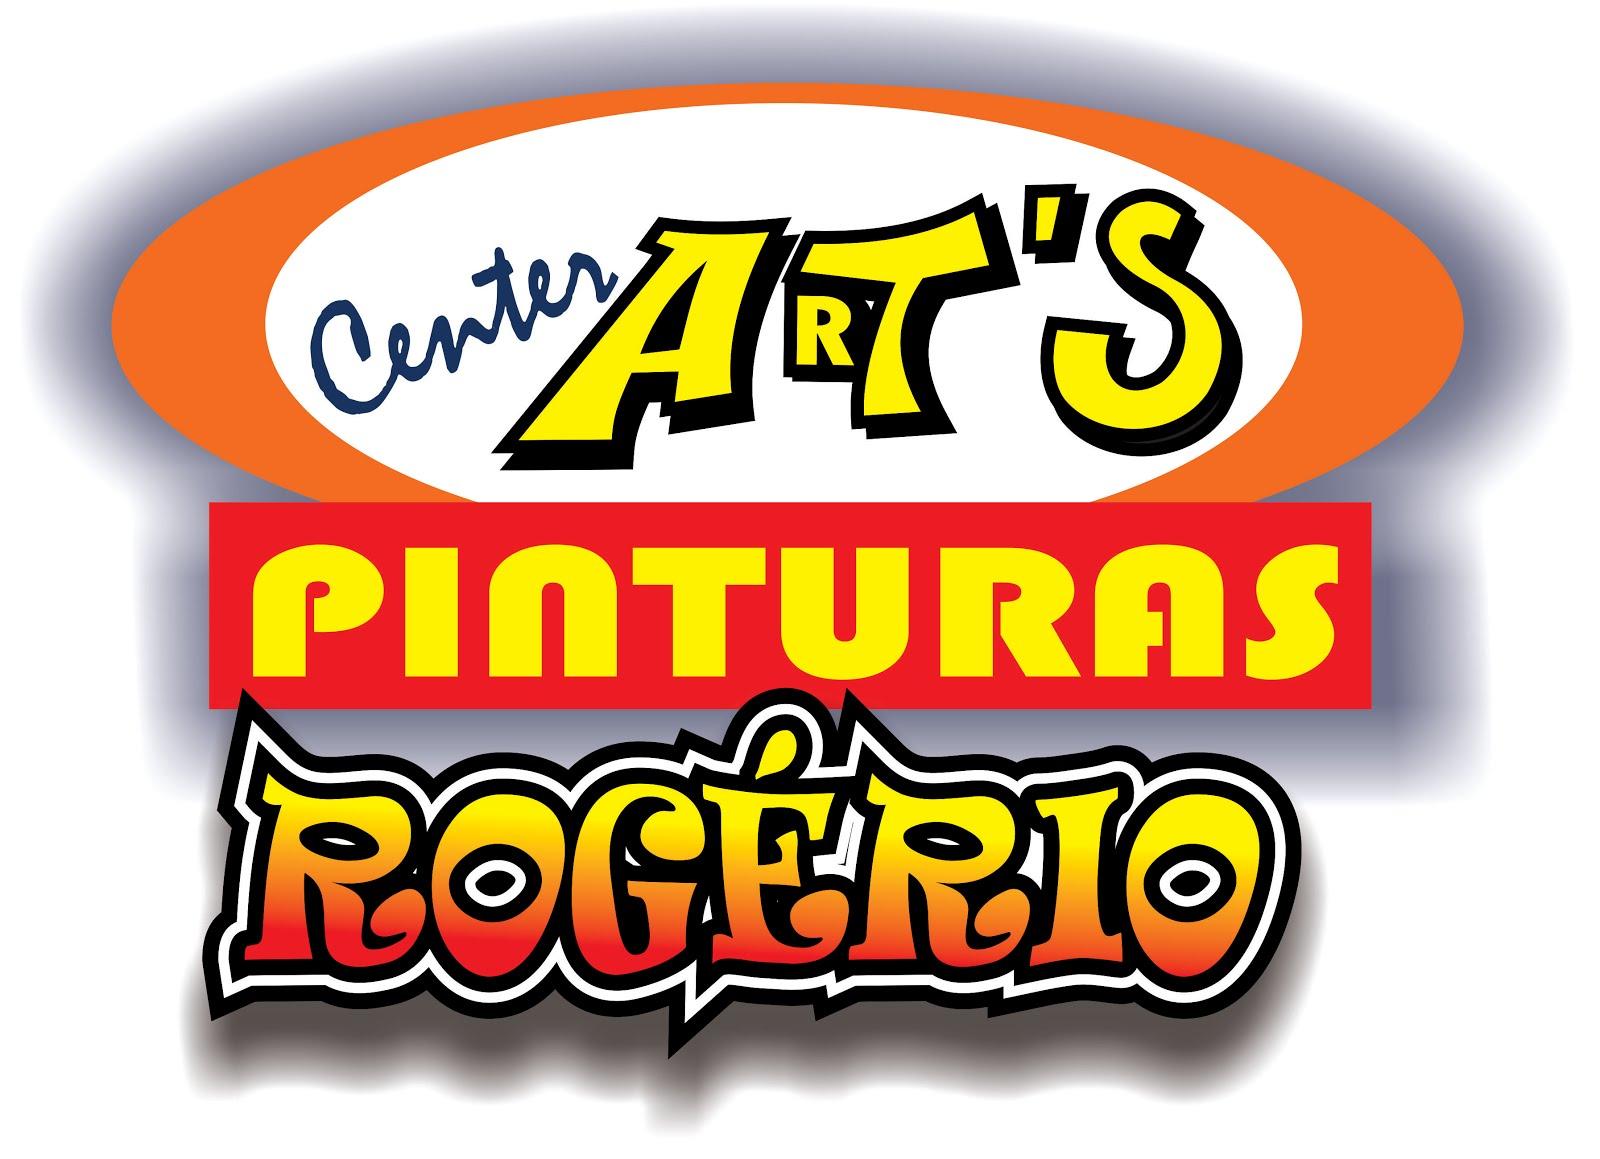 PATROCÍNIO  ATLETA ROGERIO